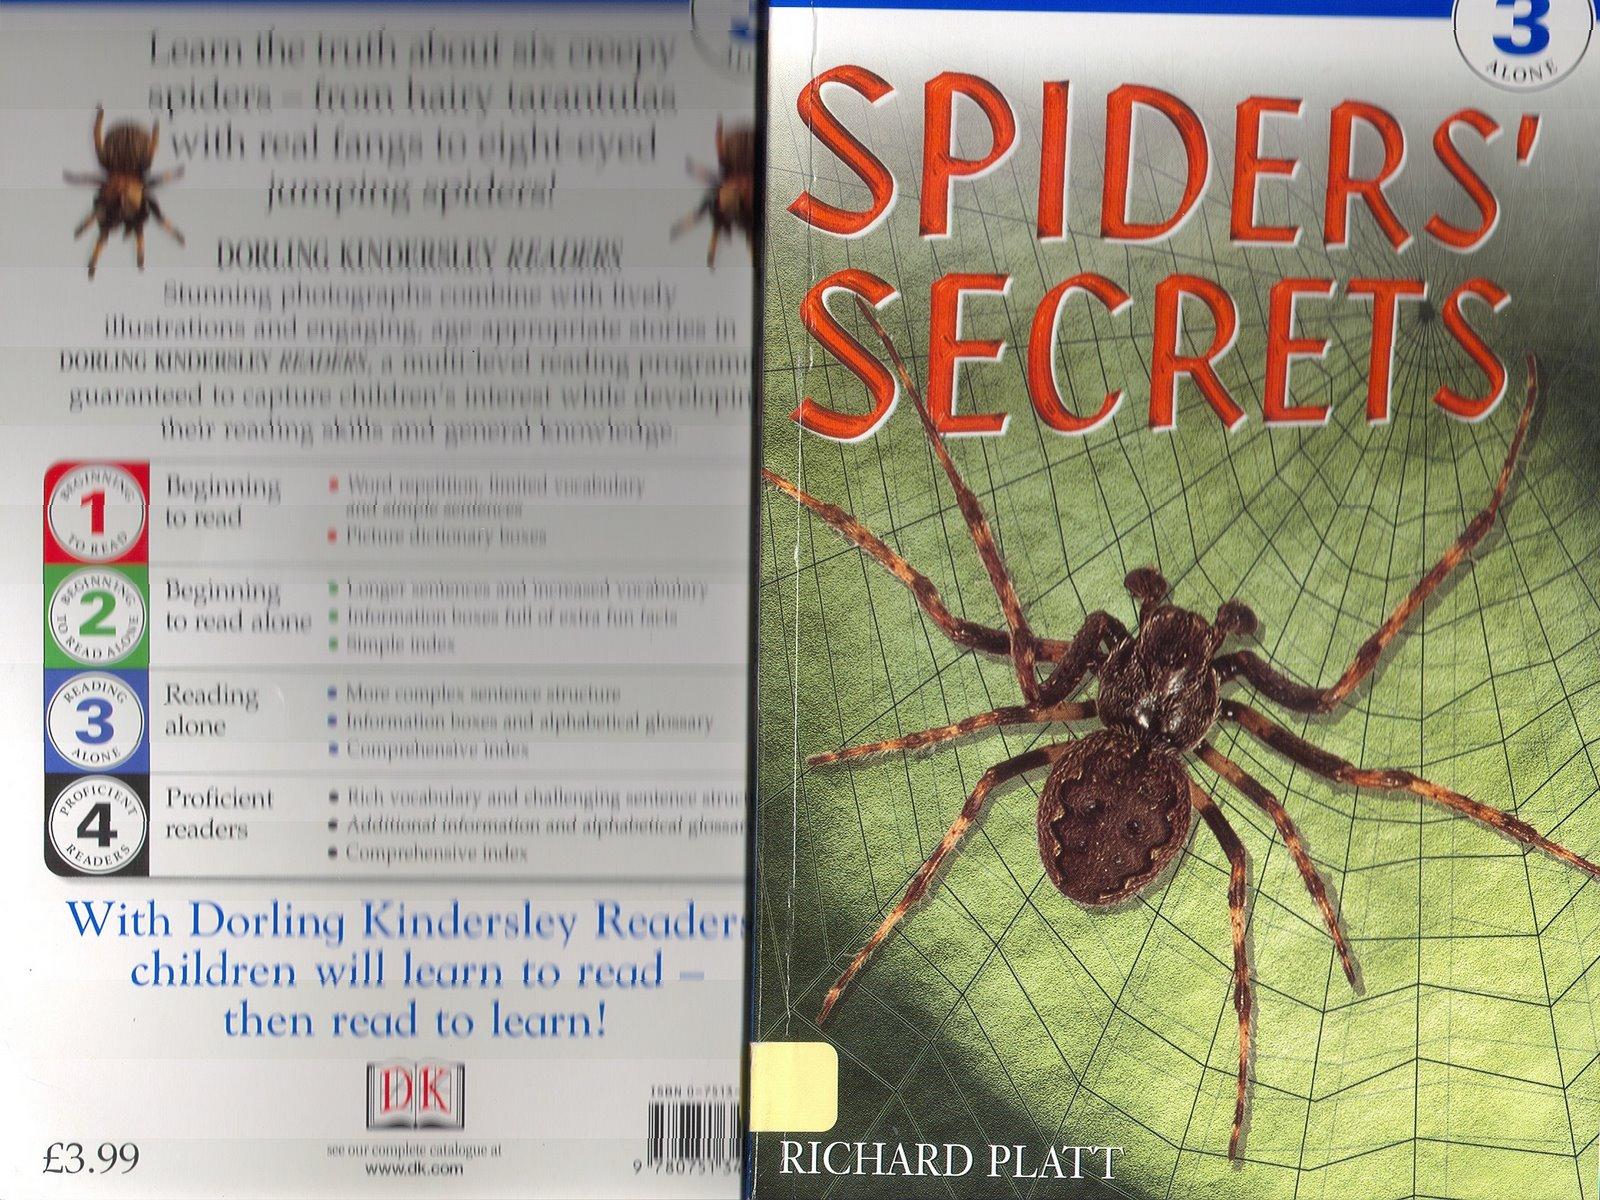 http://2.bp.blogspot.com/_GHH5wk6h8VA/R1As_5rInUI/AAAAAAAAACI/w7651alFz_s/s1600-R/spider%2525252Bcover.jpg